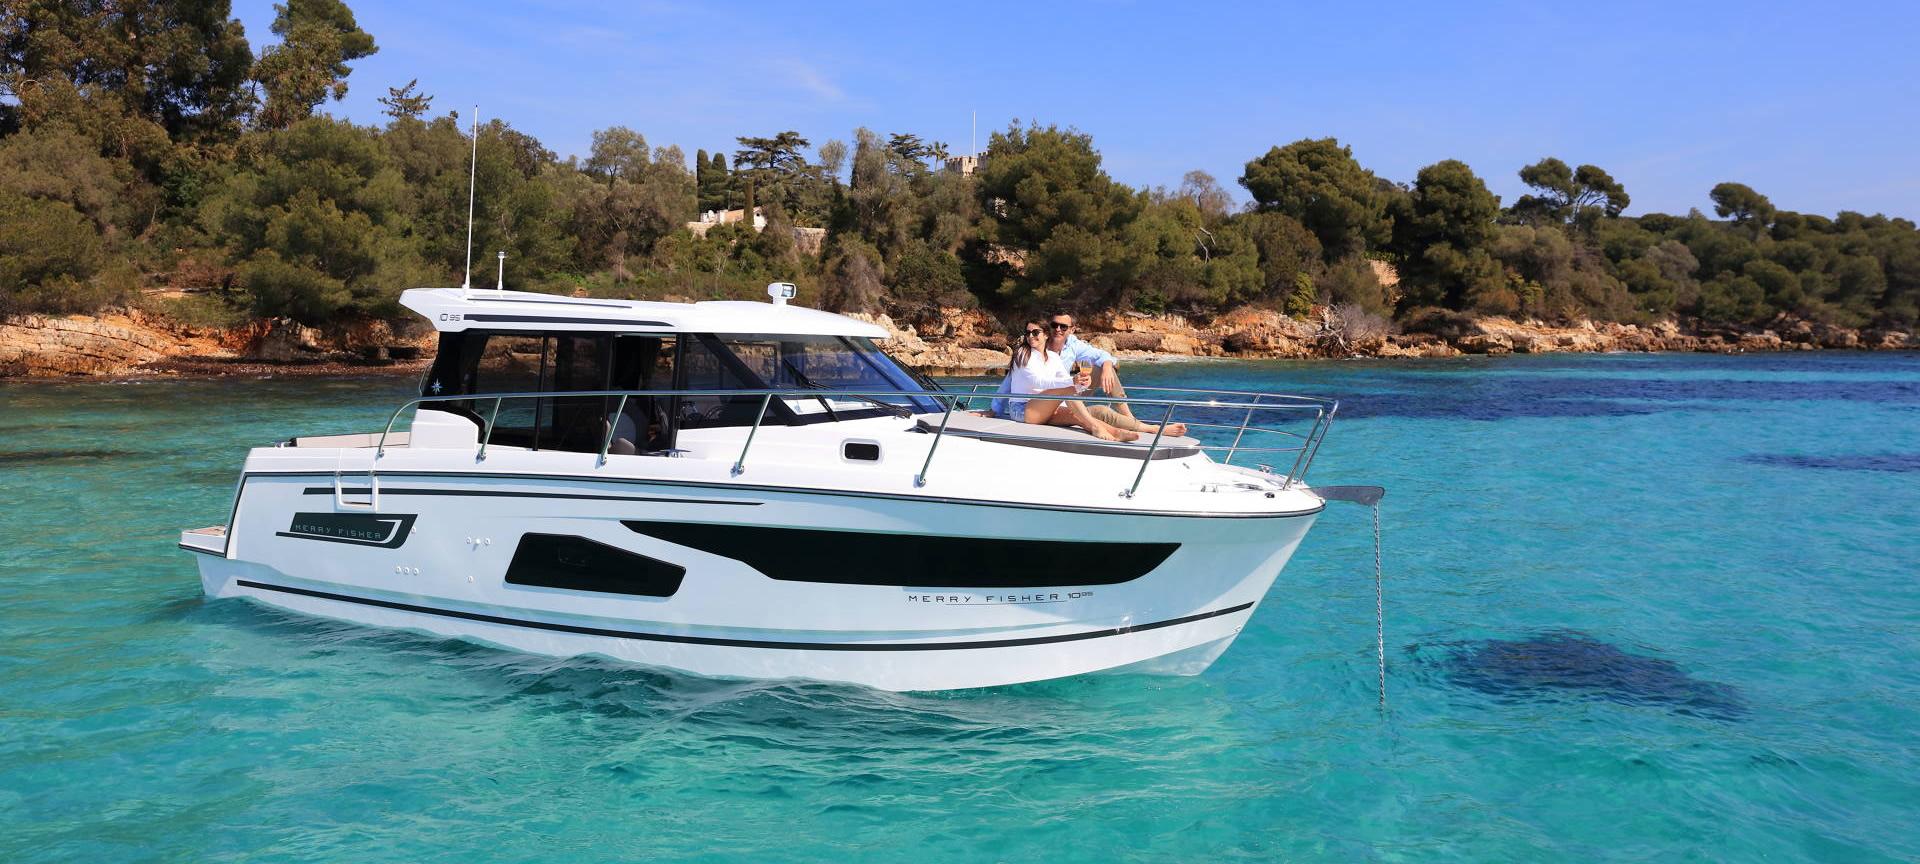 Jeanneau Australia Cruising Race Yachts Merry Fisher Boats